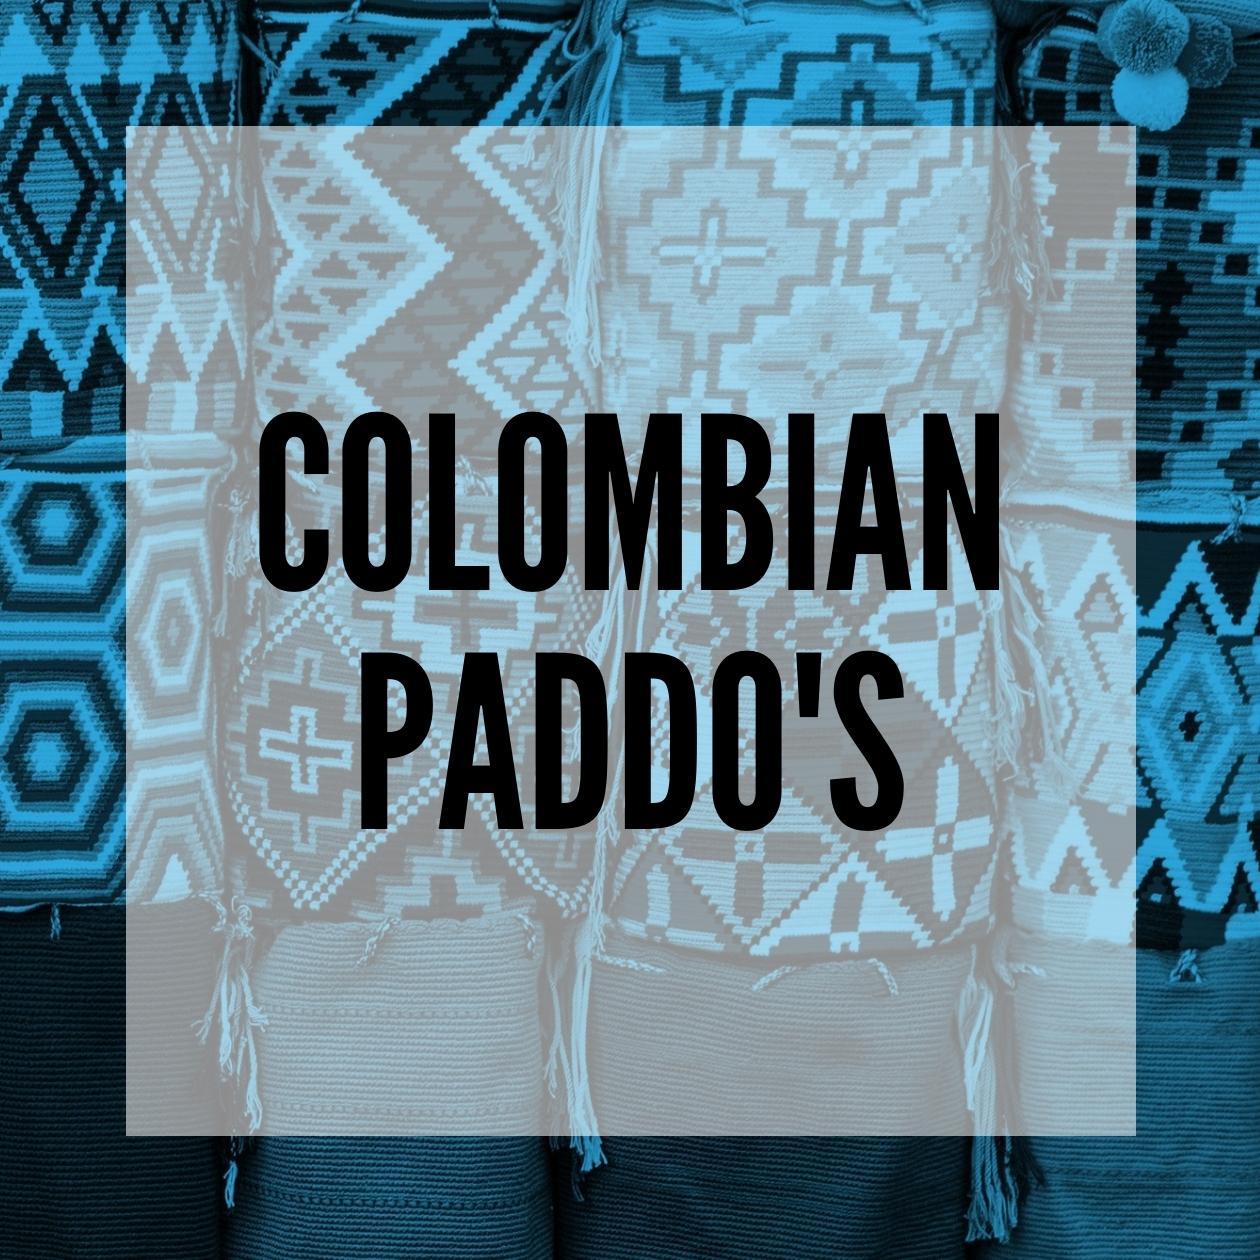 colombian Paddo